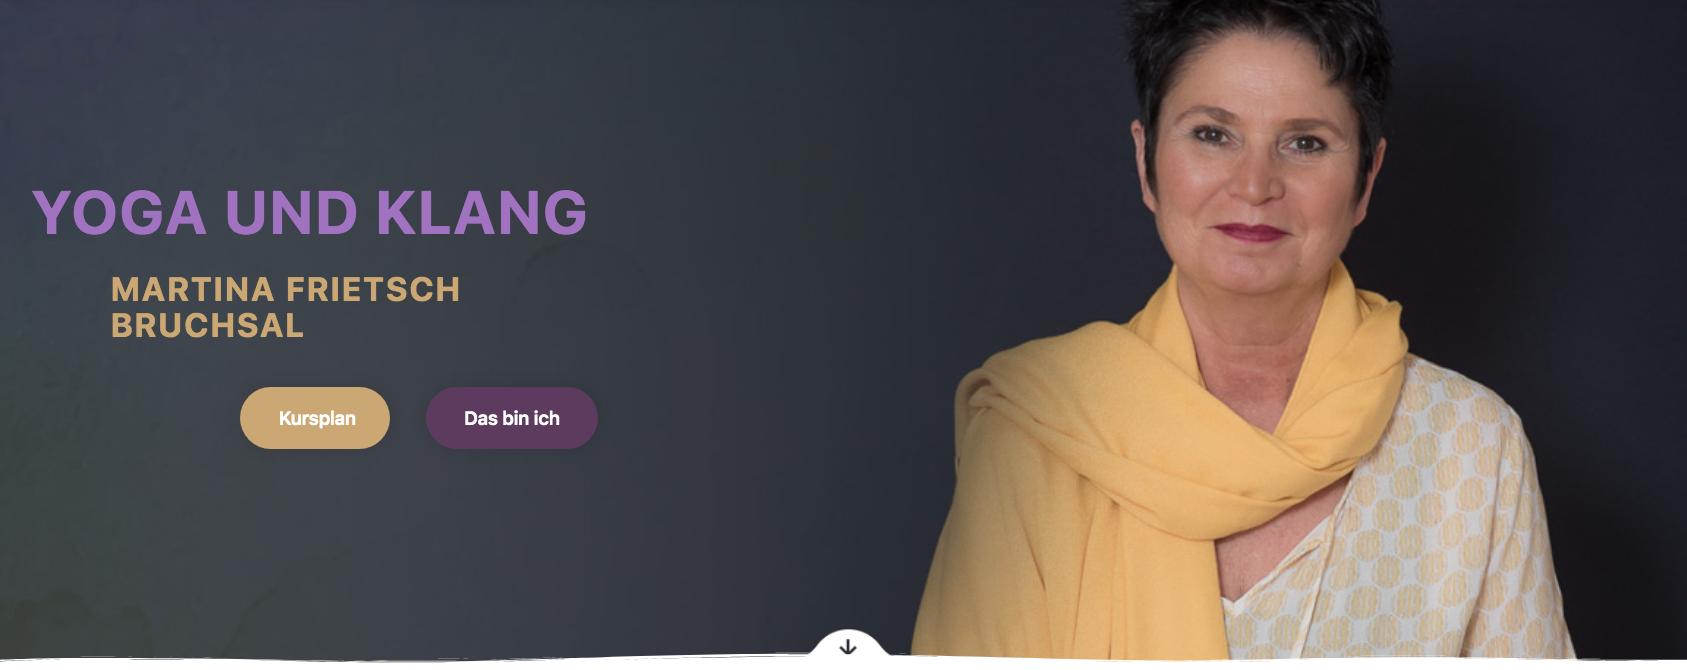 Webseite für Yoga Studio & Klang Massagen Martina Frietsch, Bruchsal